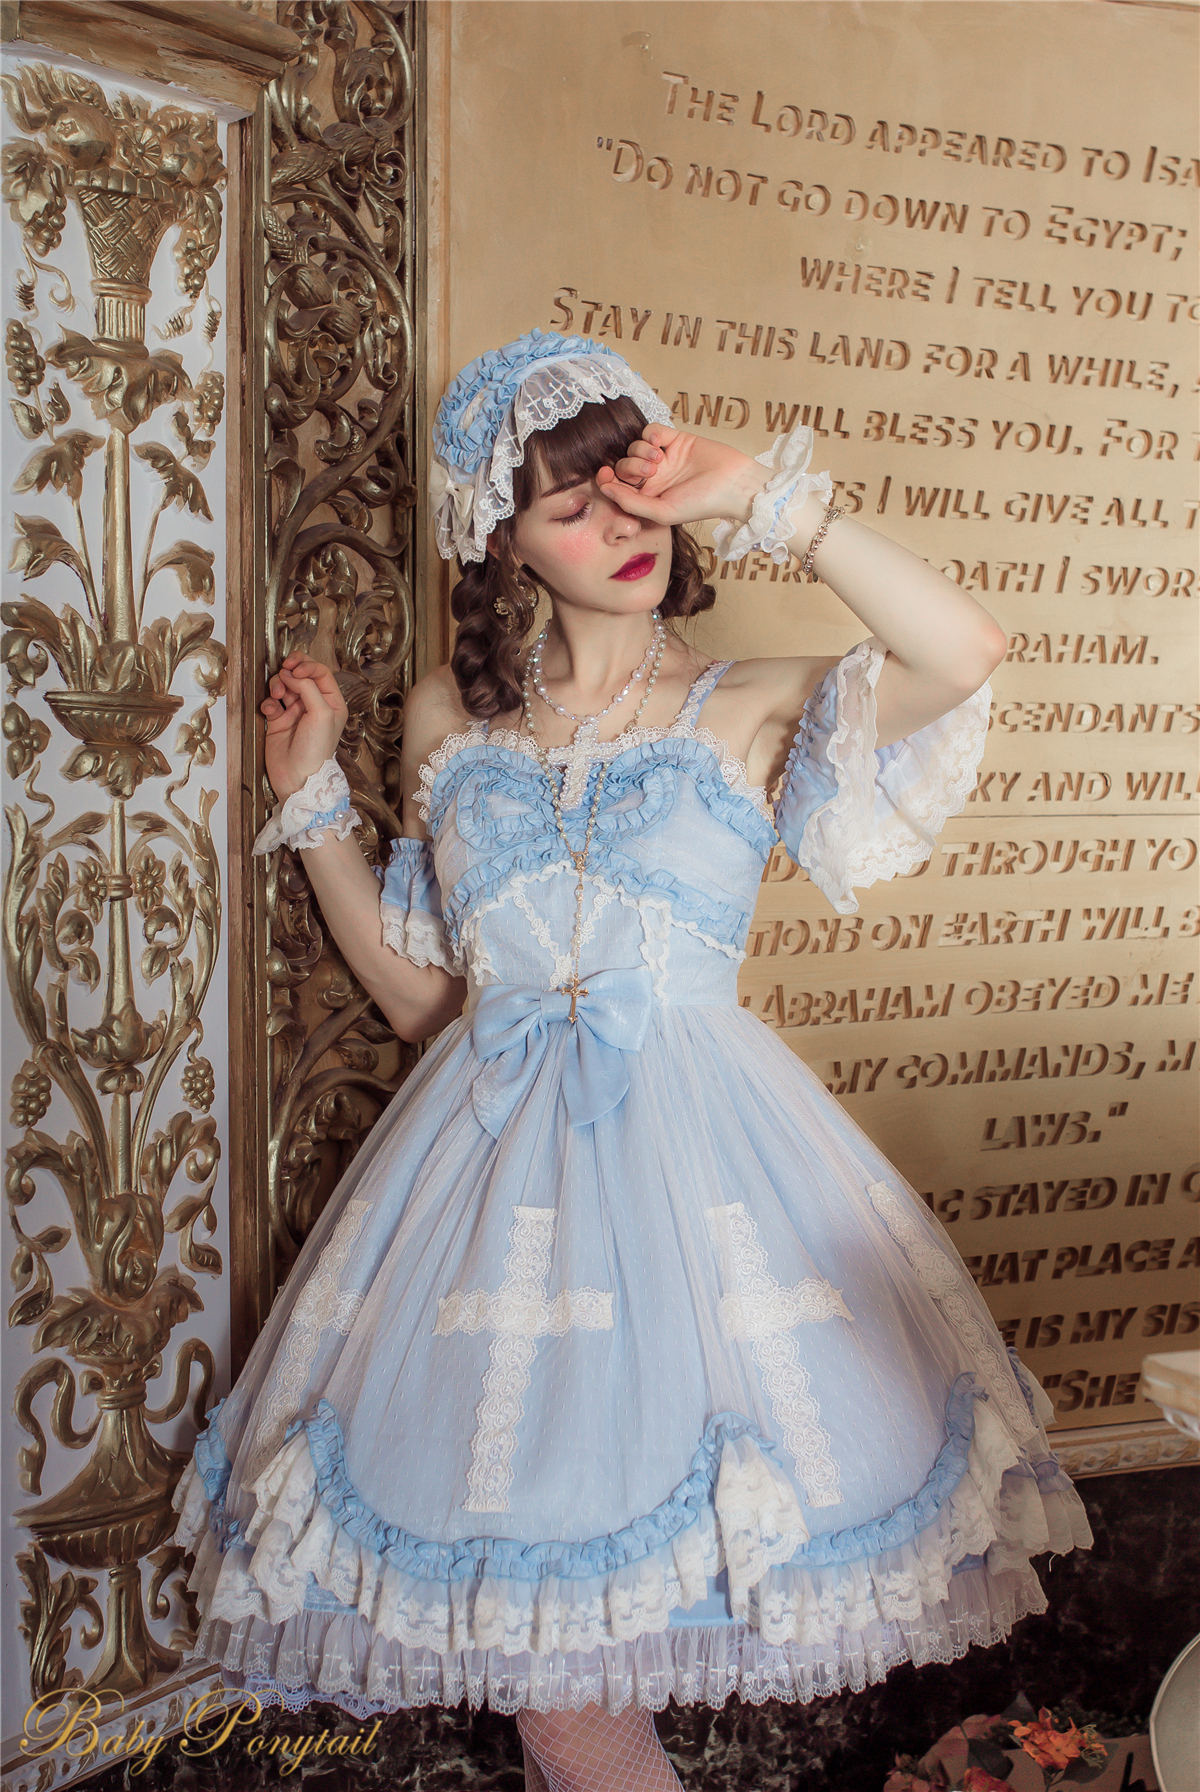 Babyponytail_Heavenly Teardrops_Model photo_JSK_Sax_Claudia_indoor_01.jpg